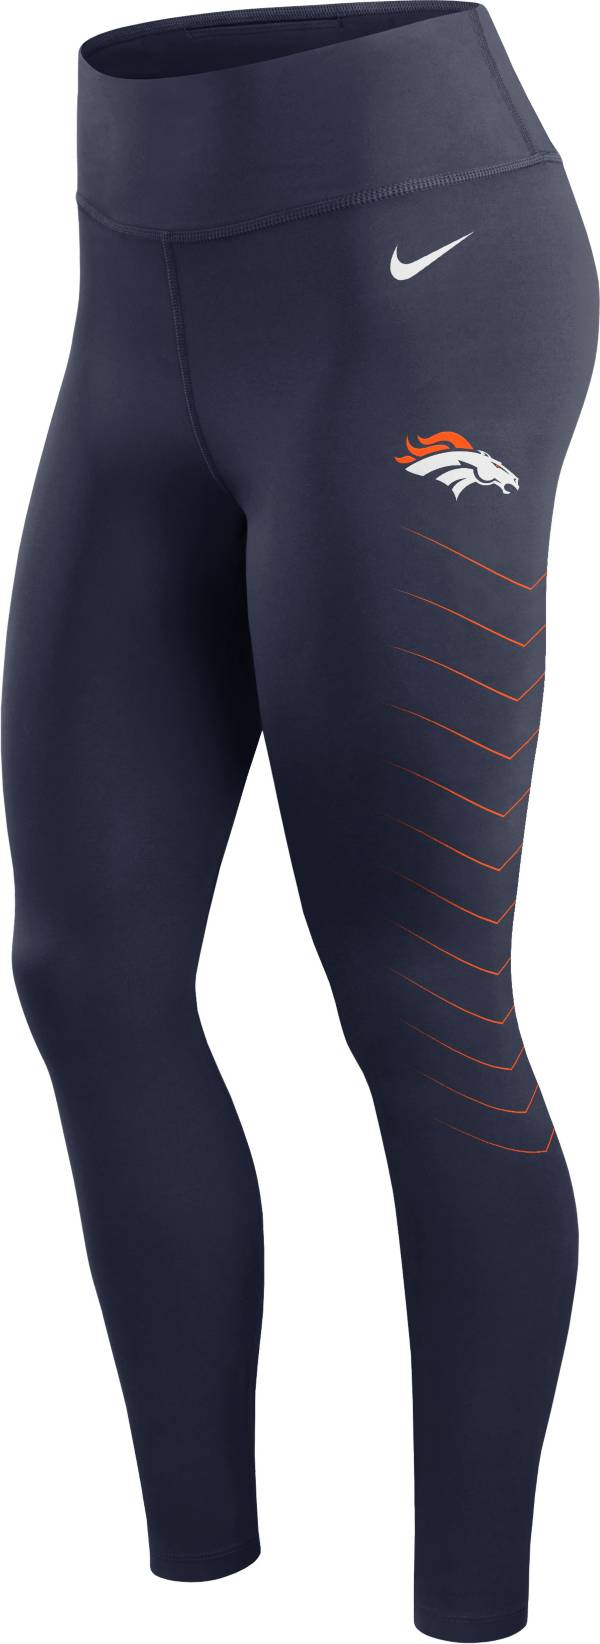 Nike Women's Denver Broncos Dri-FIT Navy Performance Leggings product image